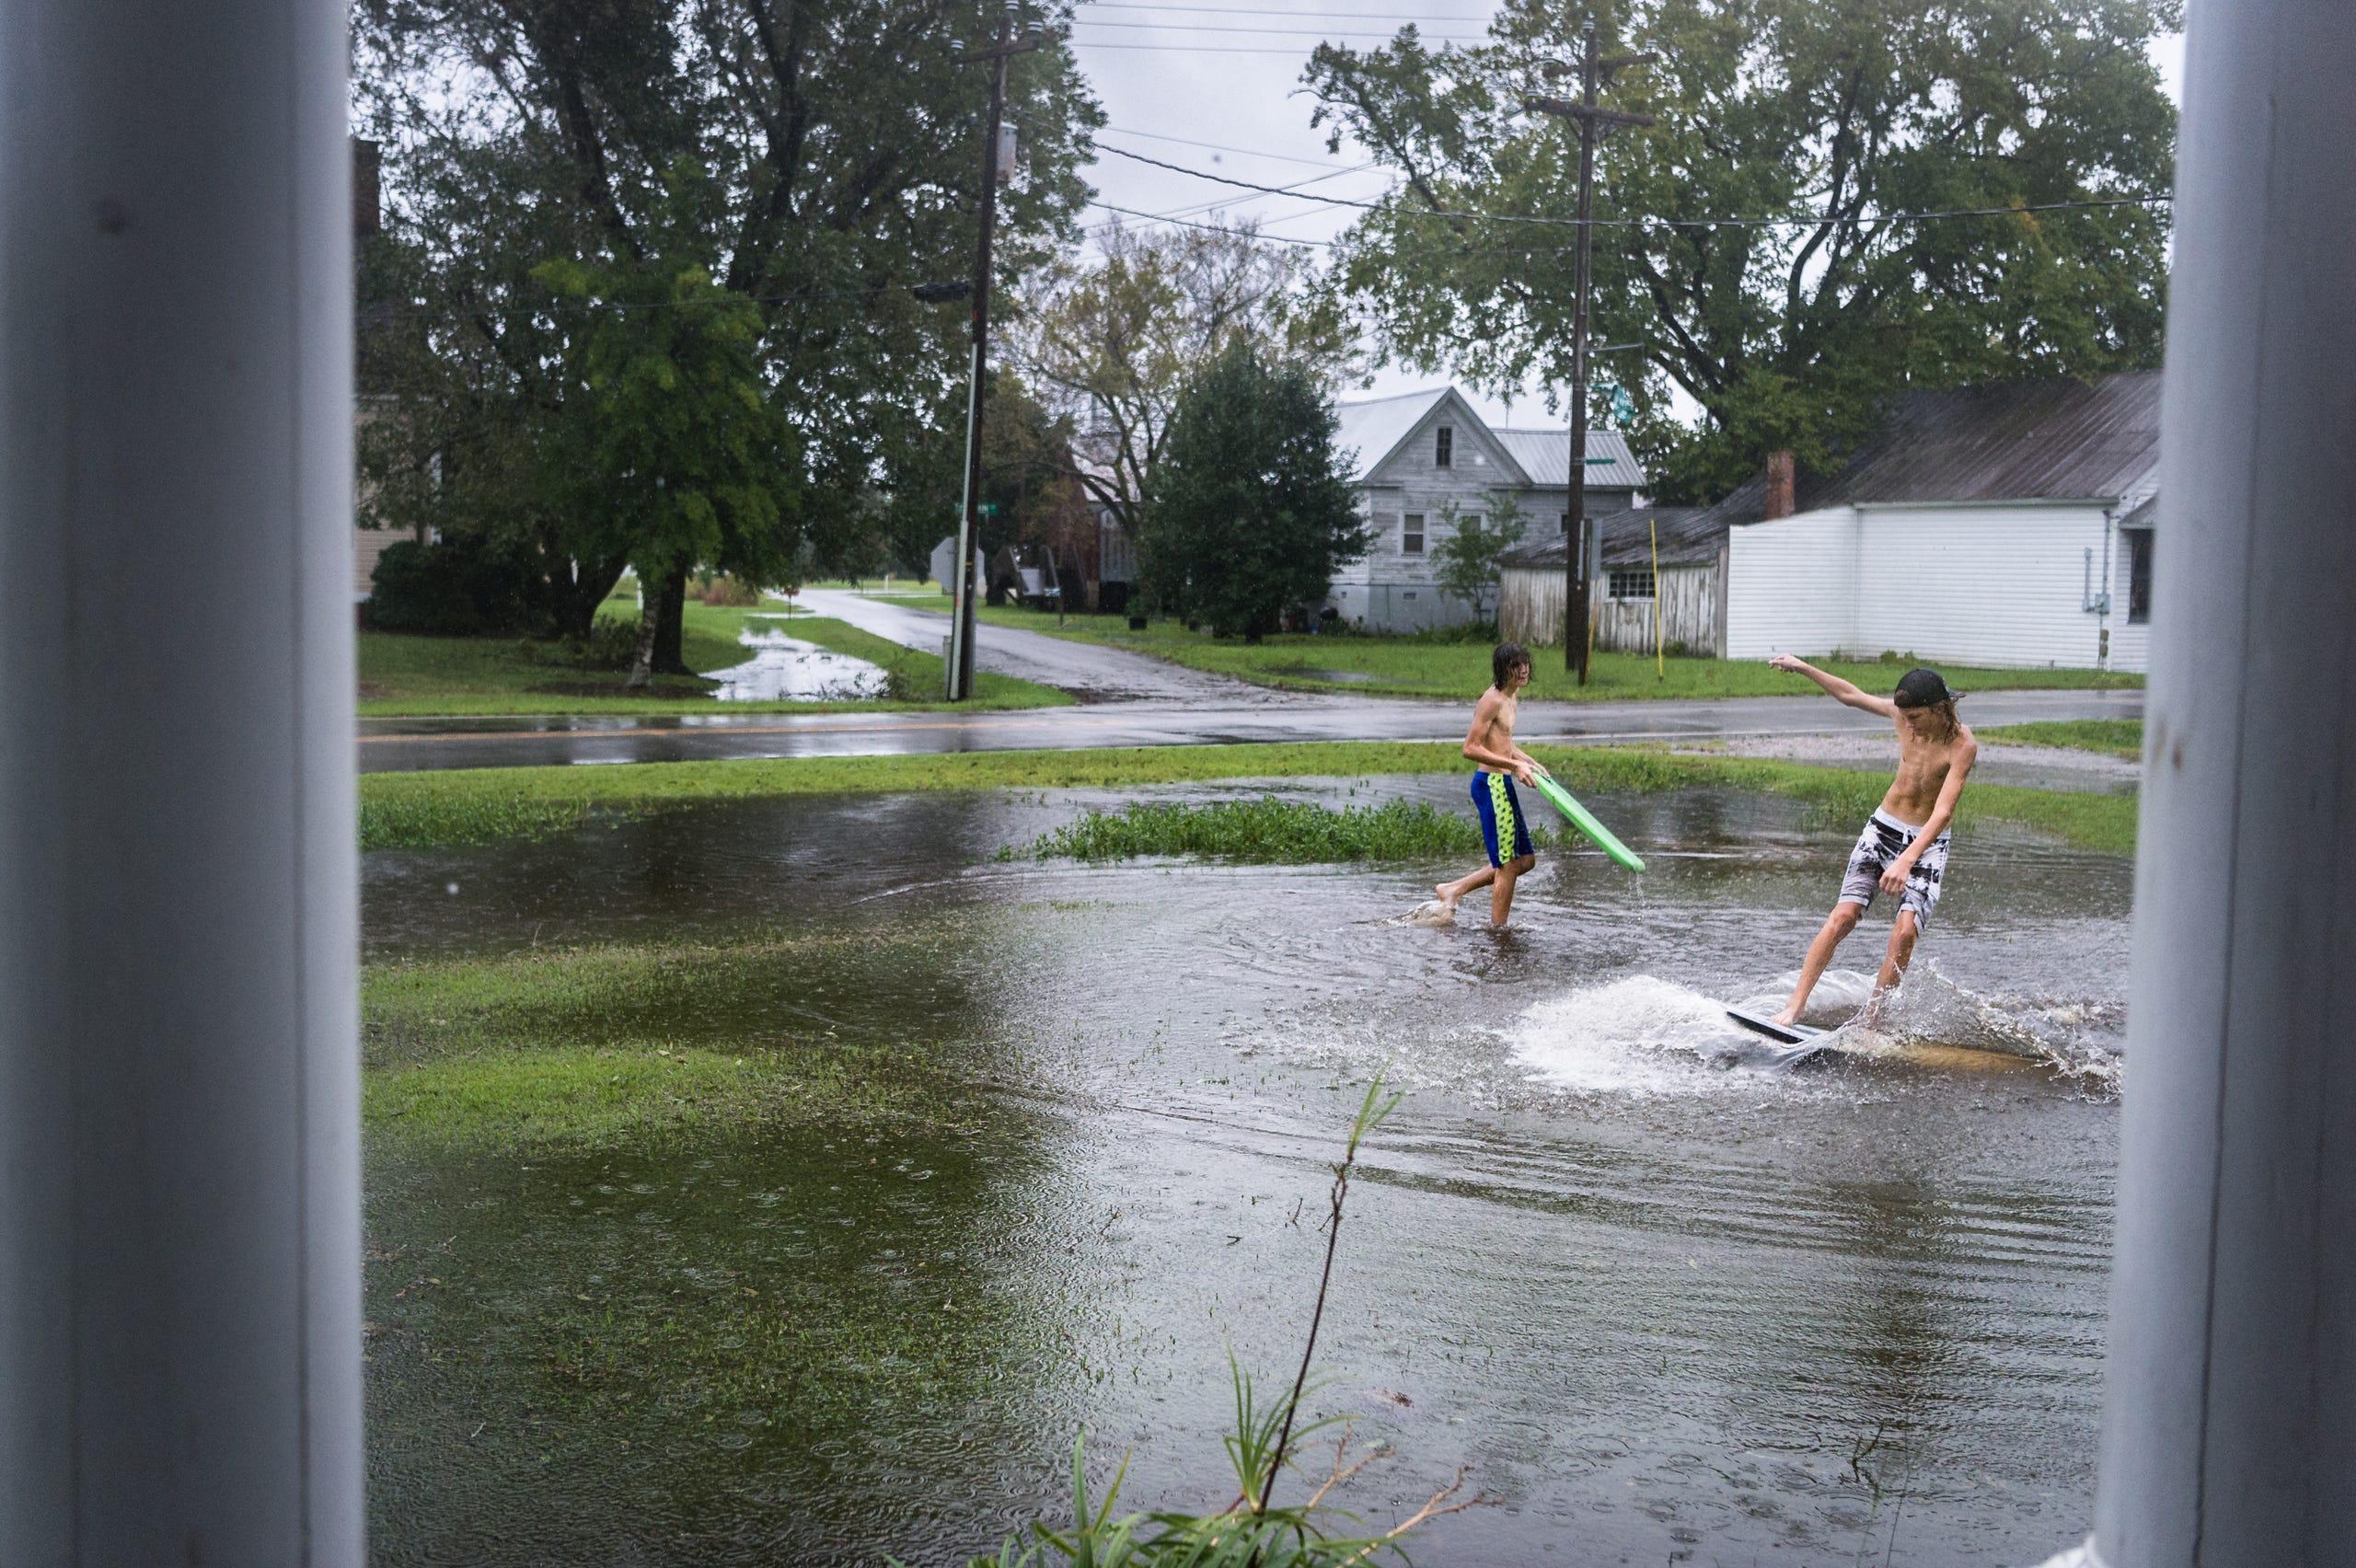 Hurricane Florence hits coast with heavy rain, storm surge